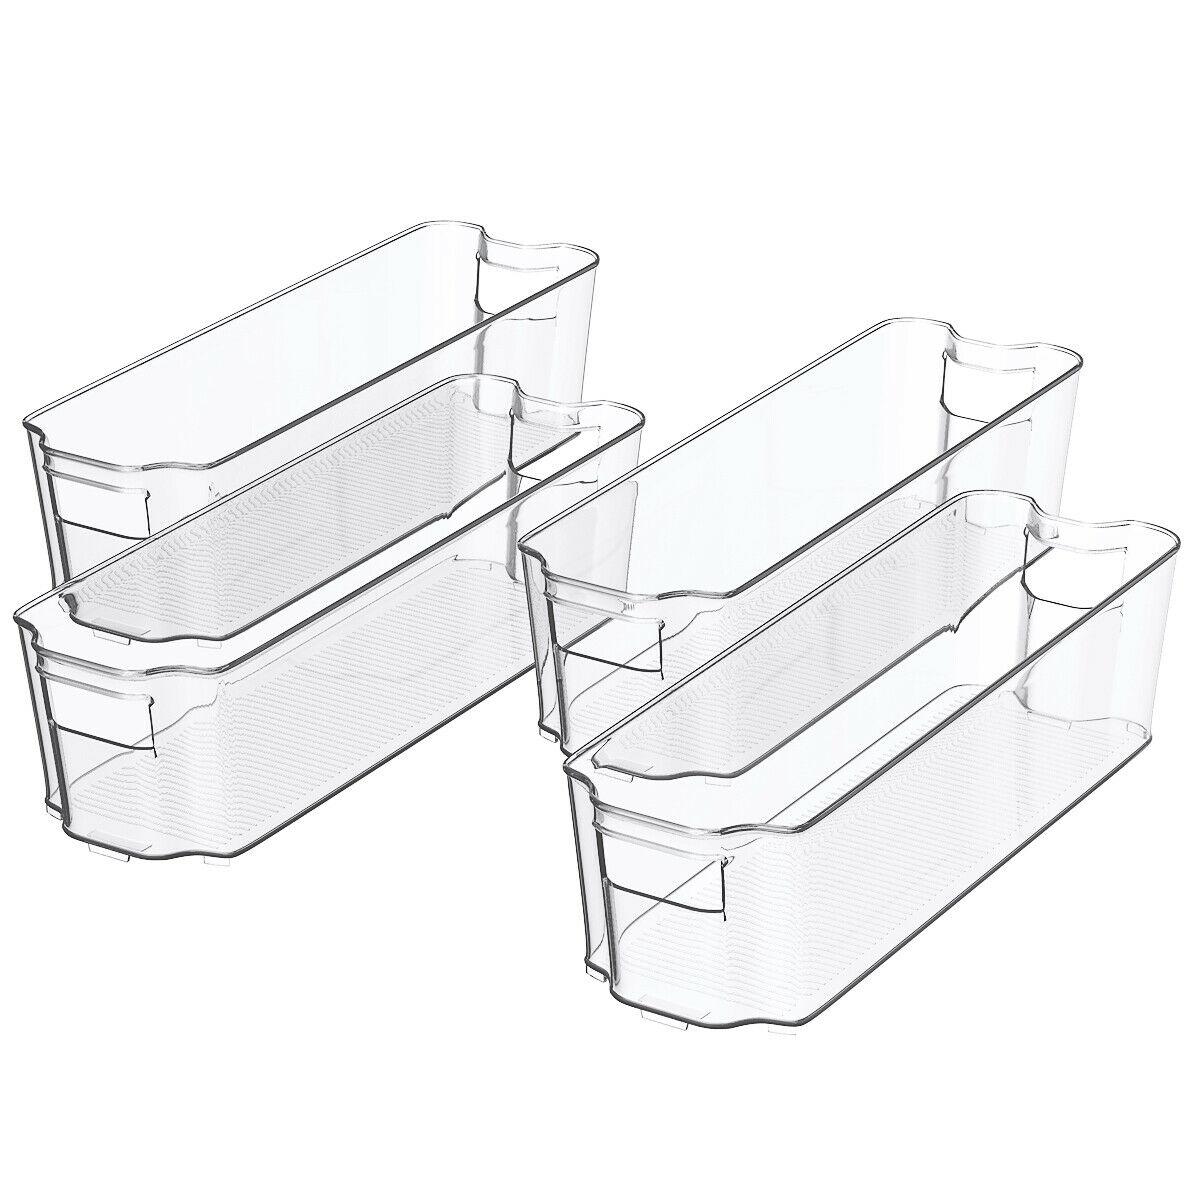 Set of 4 Stackable Refrigerator Organizer Bins